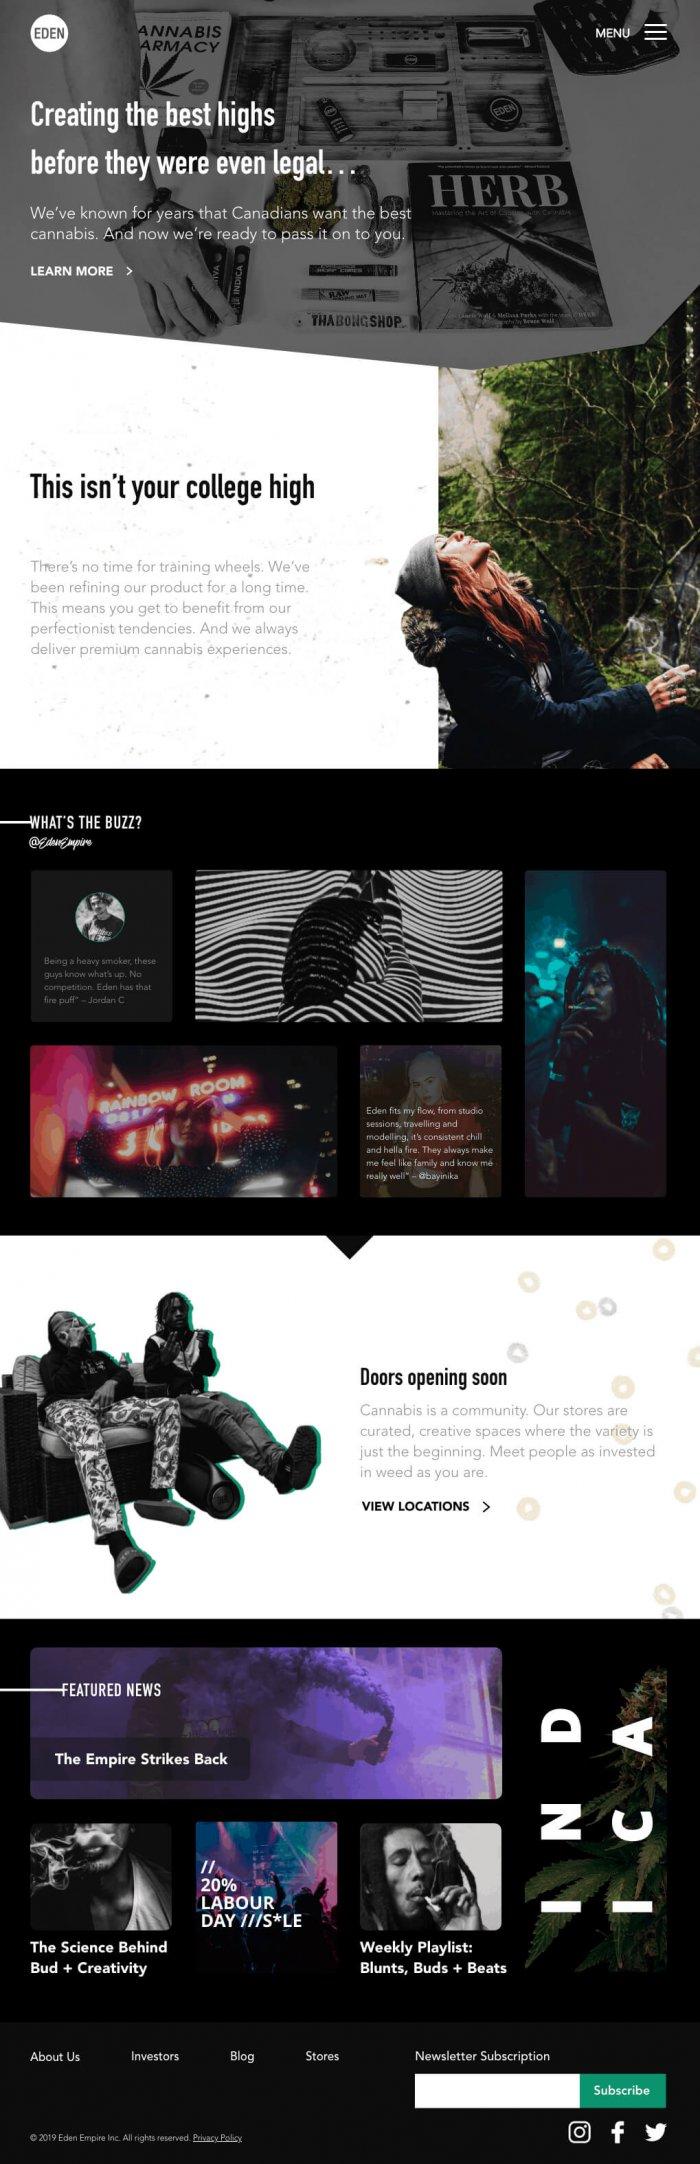 Mockup for eden empire website design